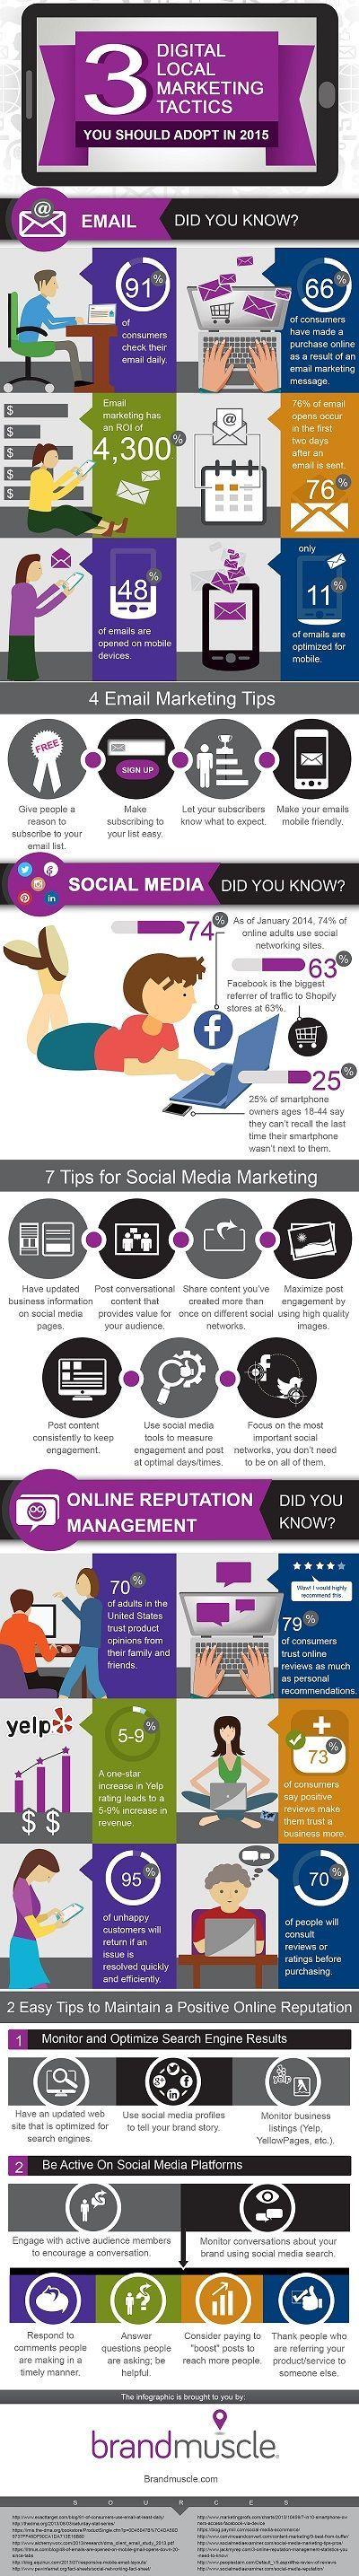 Marketing Strategy - Three Digital Marketing Tactics You Should Adopt in 2015 [Infographic] : MarketingProfs Article